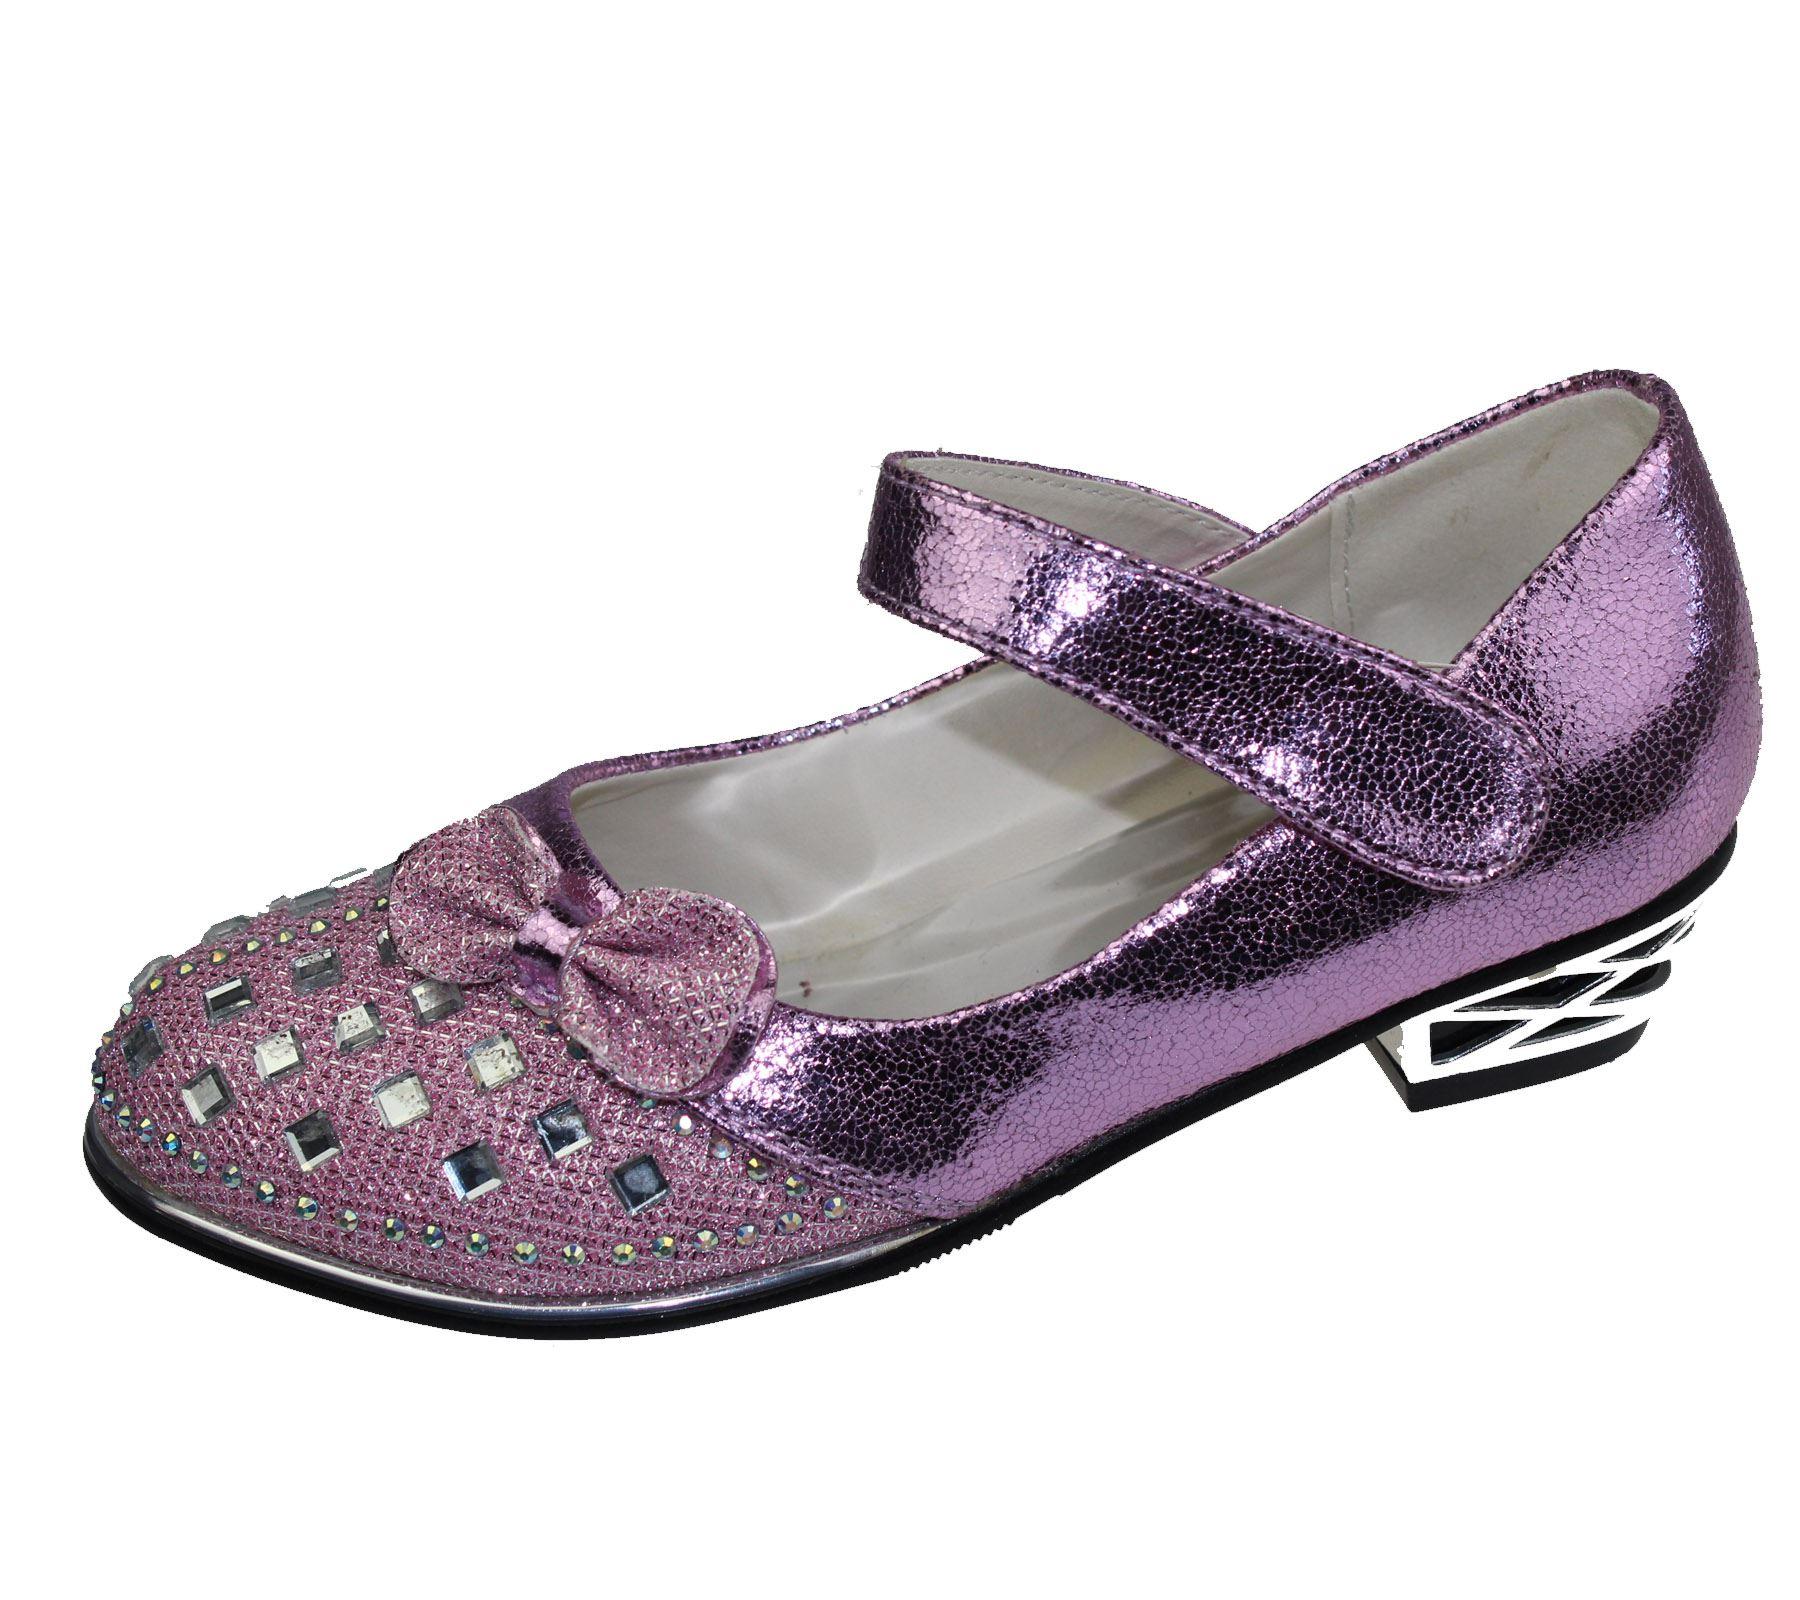 Girls Weding Dres Shoes 021 - Girls Weding Dres Shoes